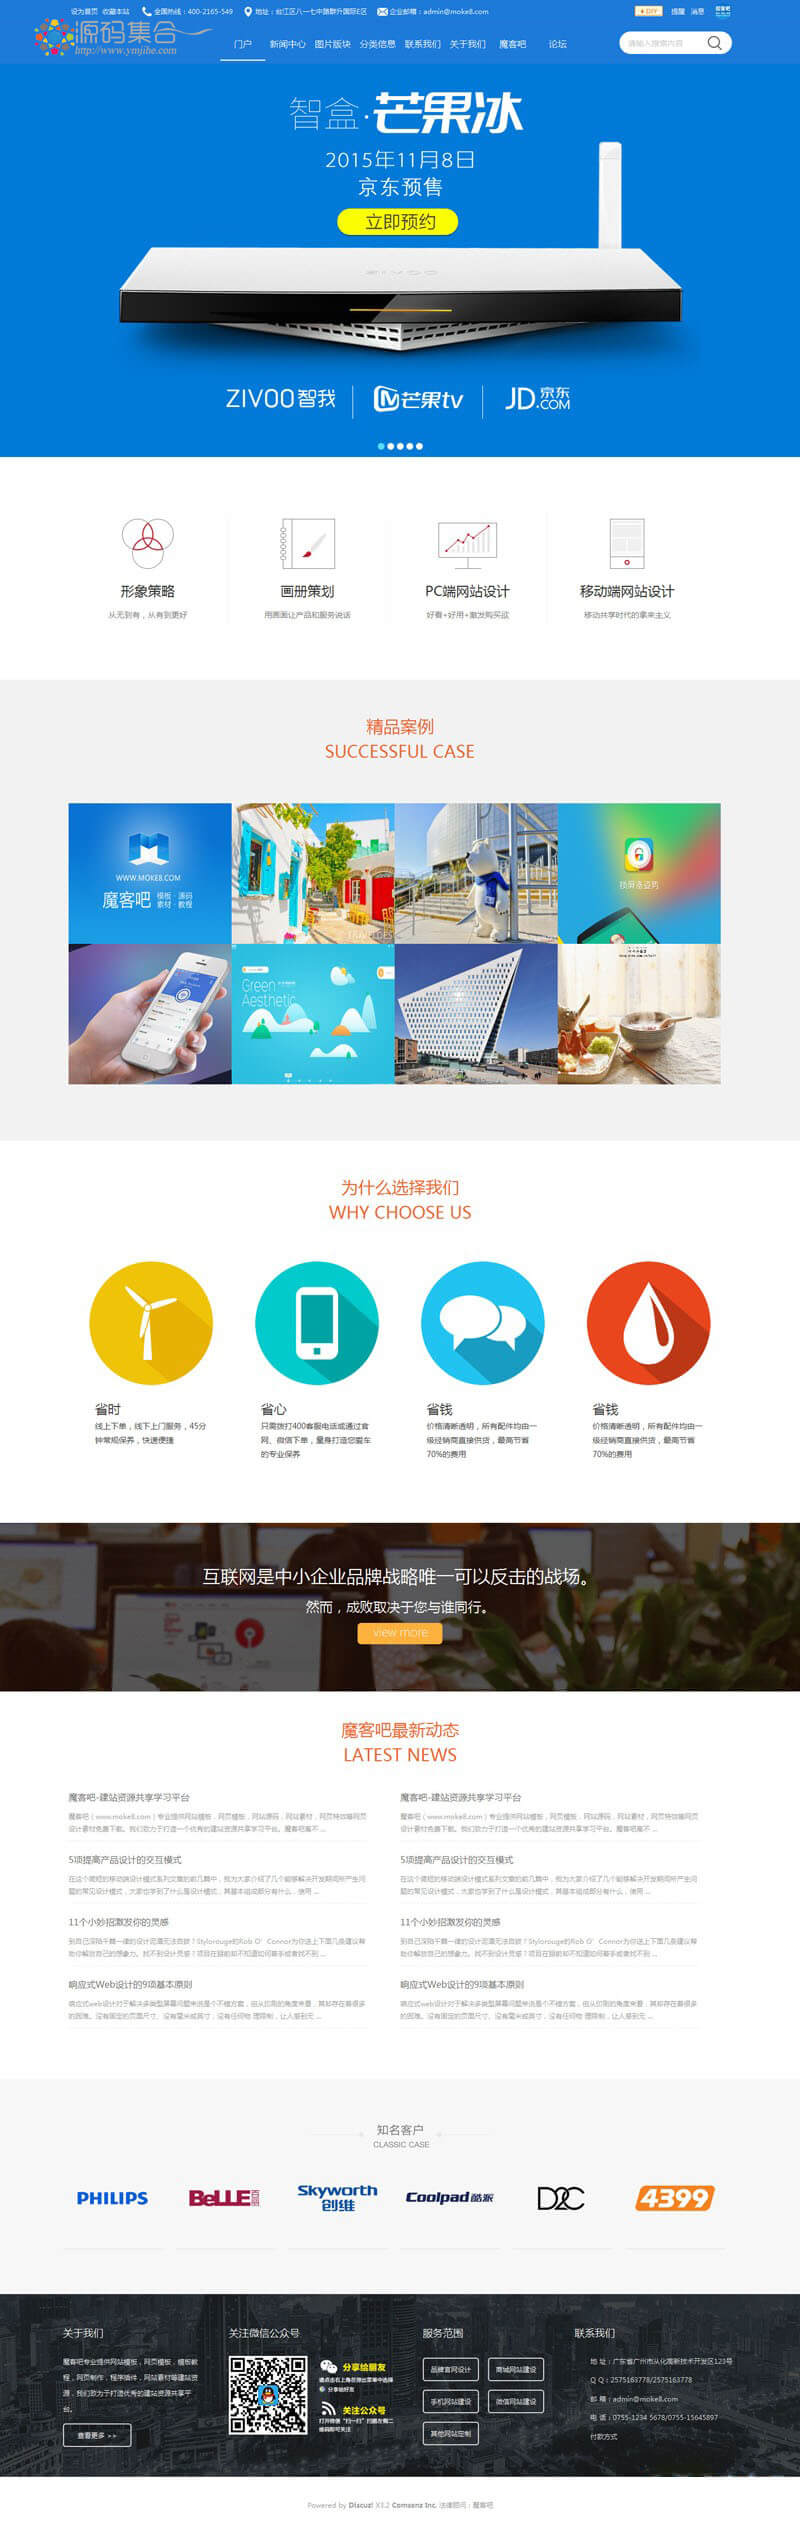 Discuz蓝色风格简约企业网站模板分享